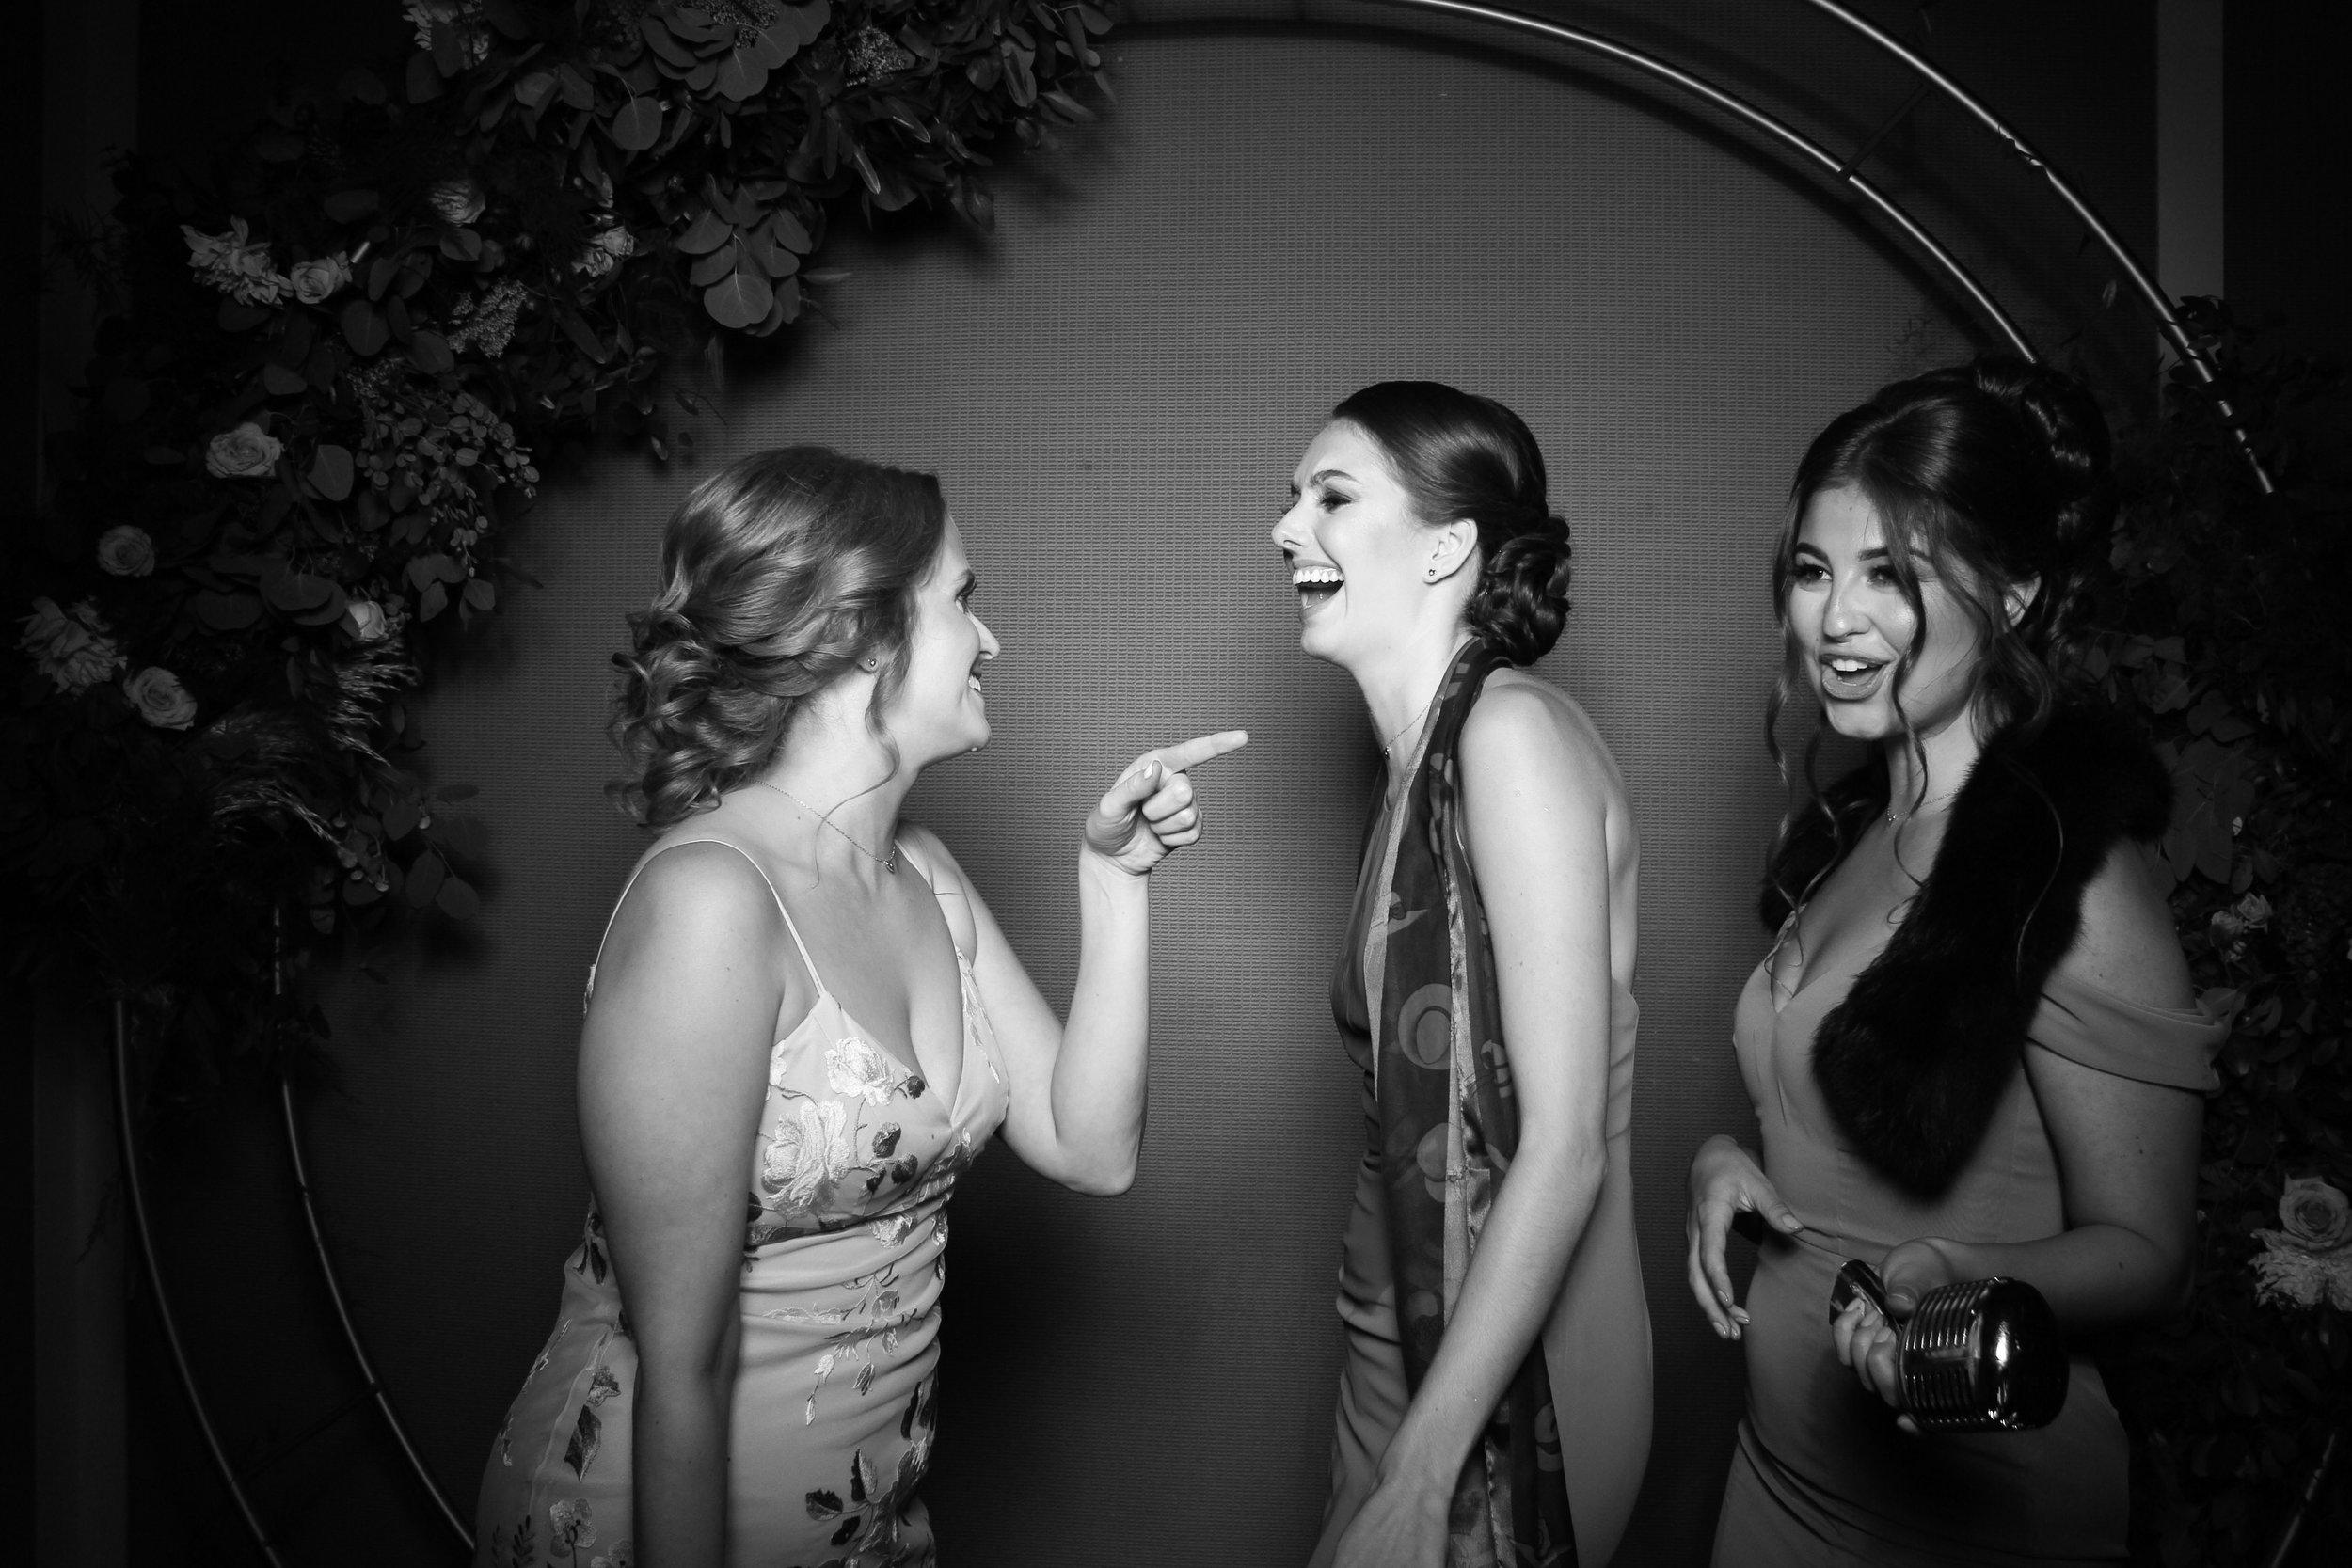 Metropolis_Ballroom_Wedding_Arlington_Heights_Photo_Booth_04.jpg